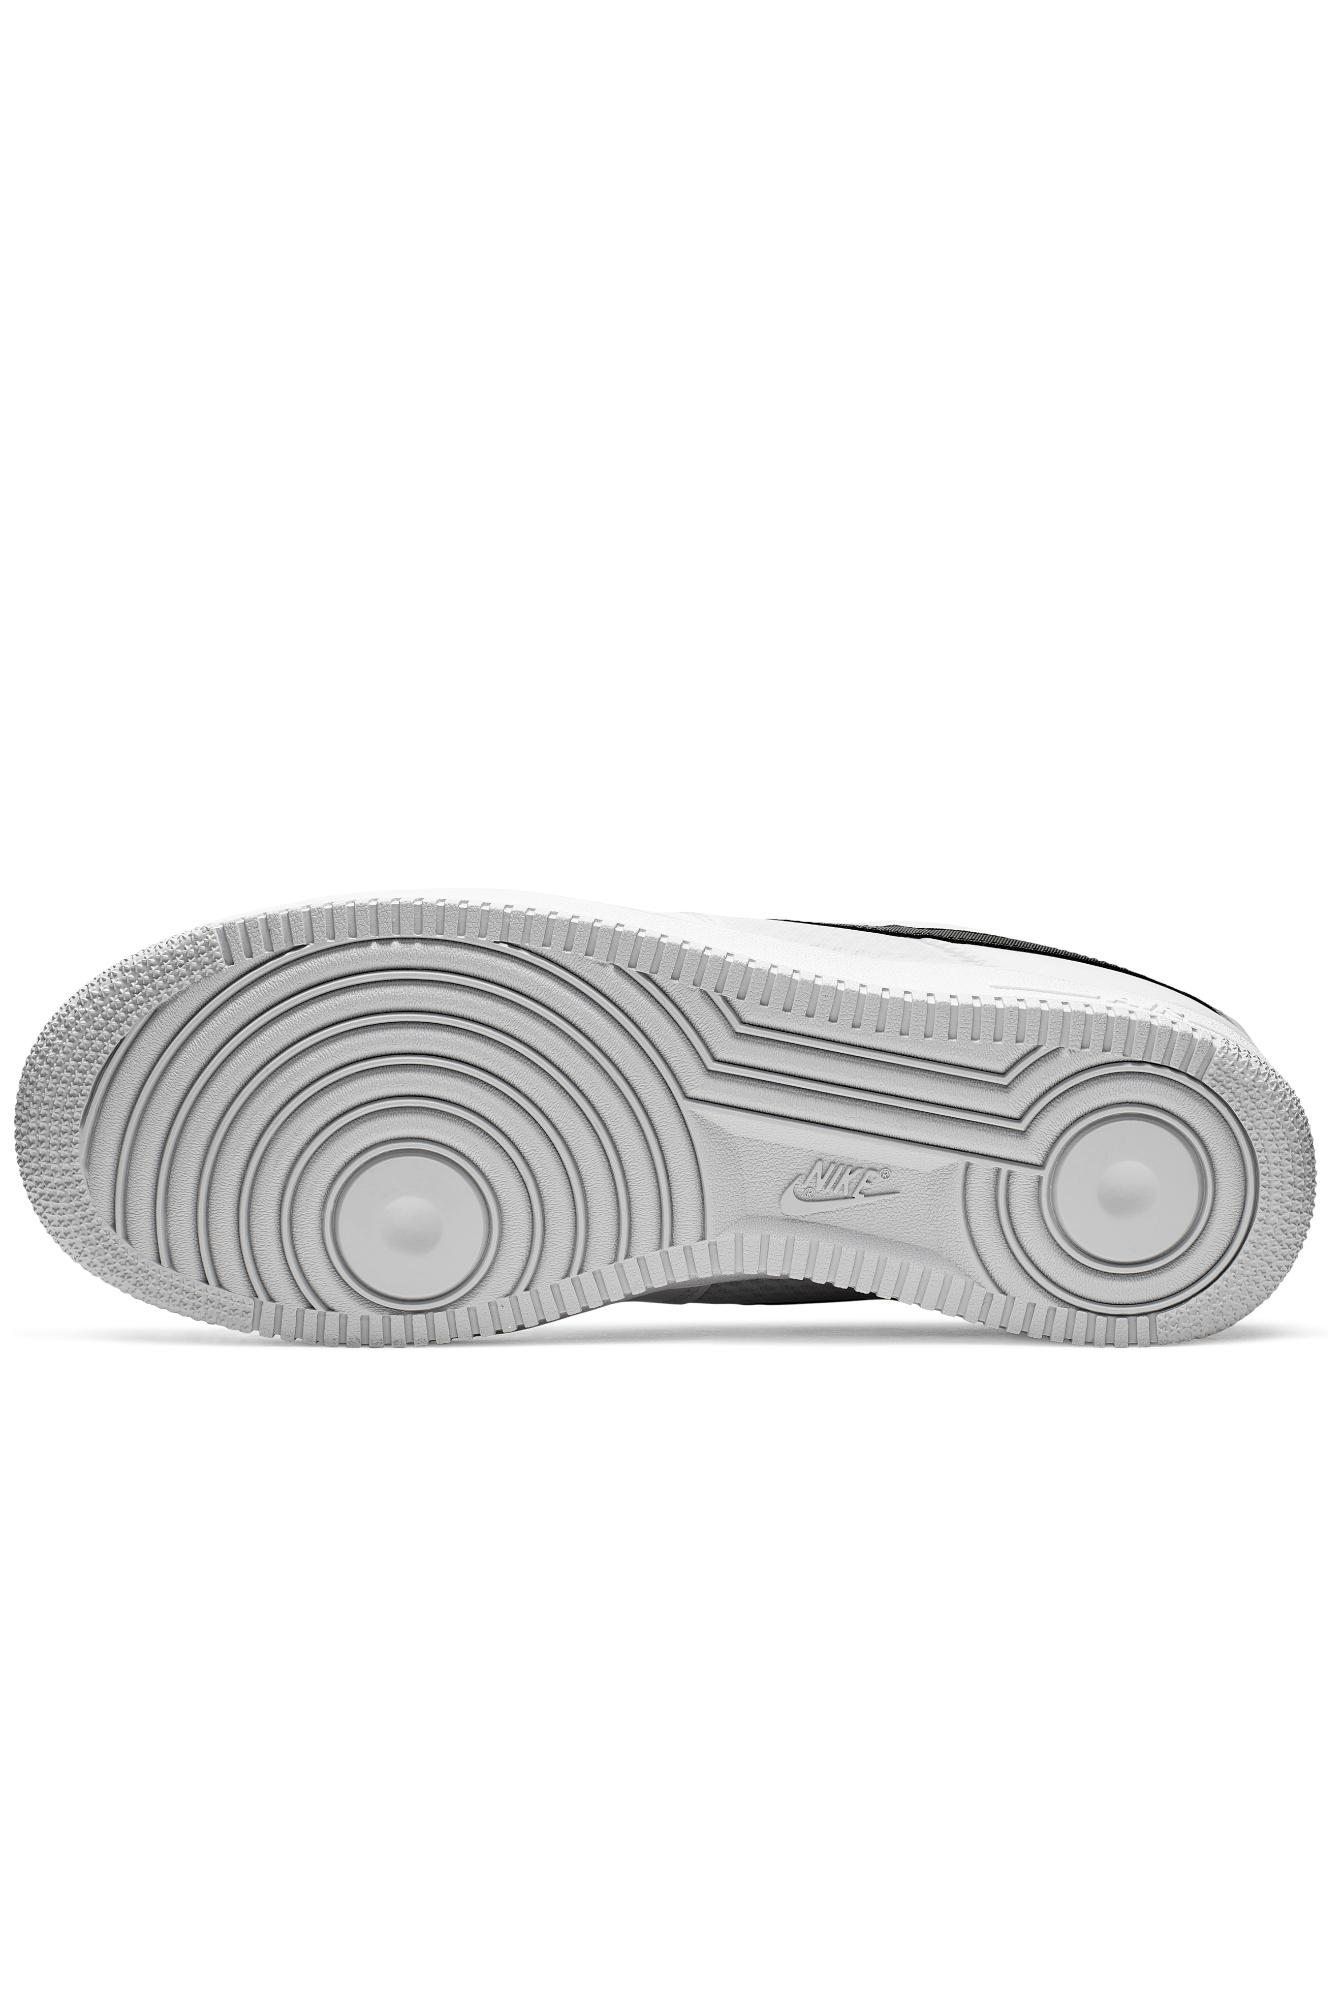 Buty Nike Air Force 1 '07 LV8 CI0060 100 Na co dzień